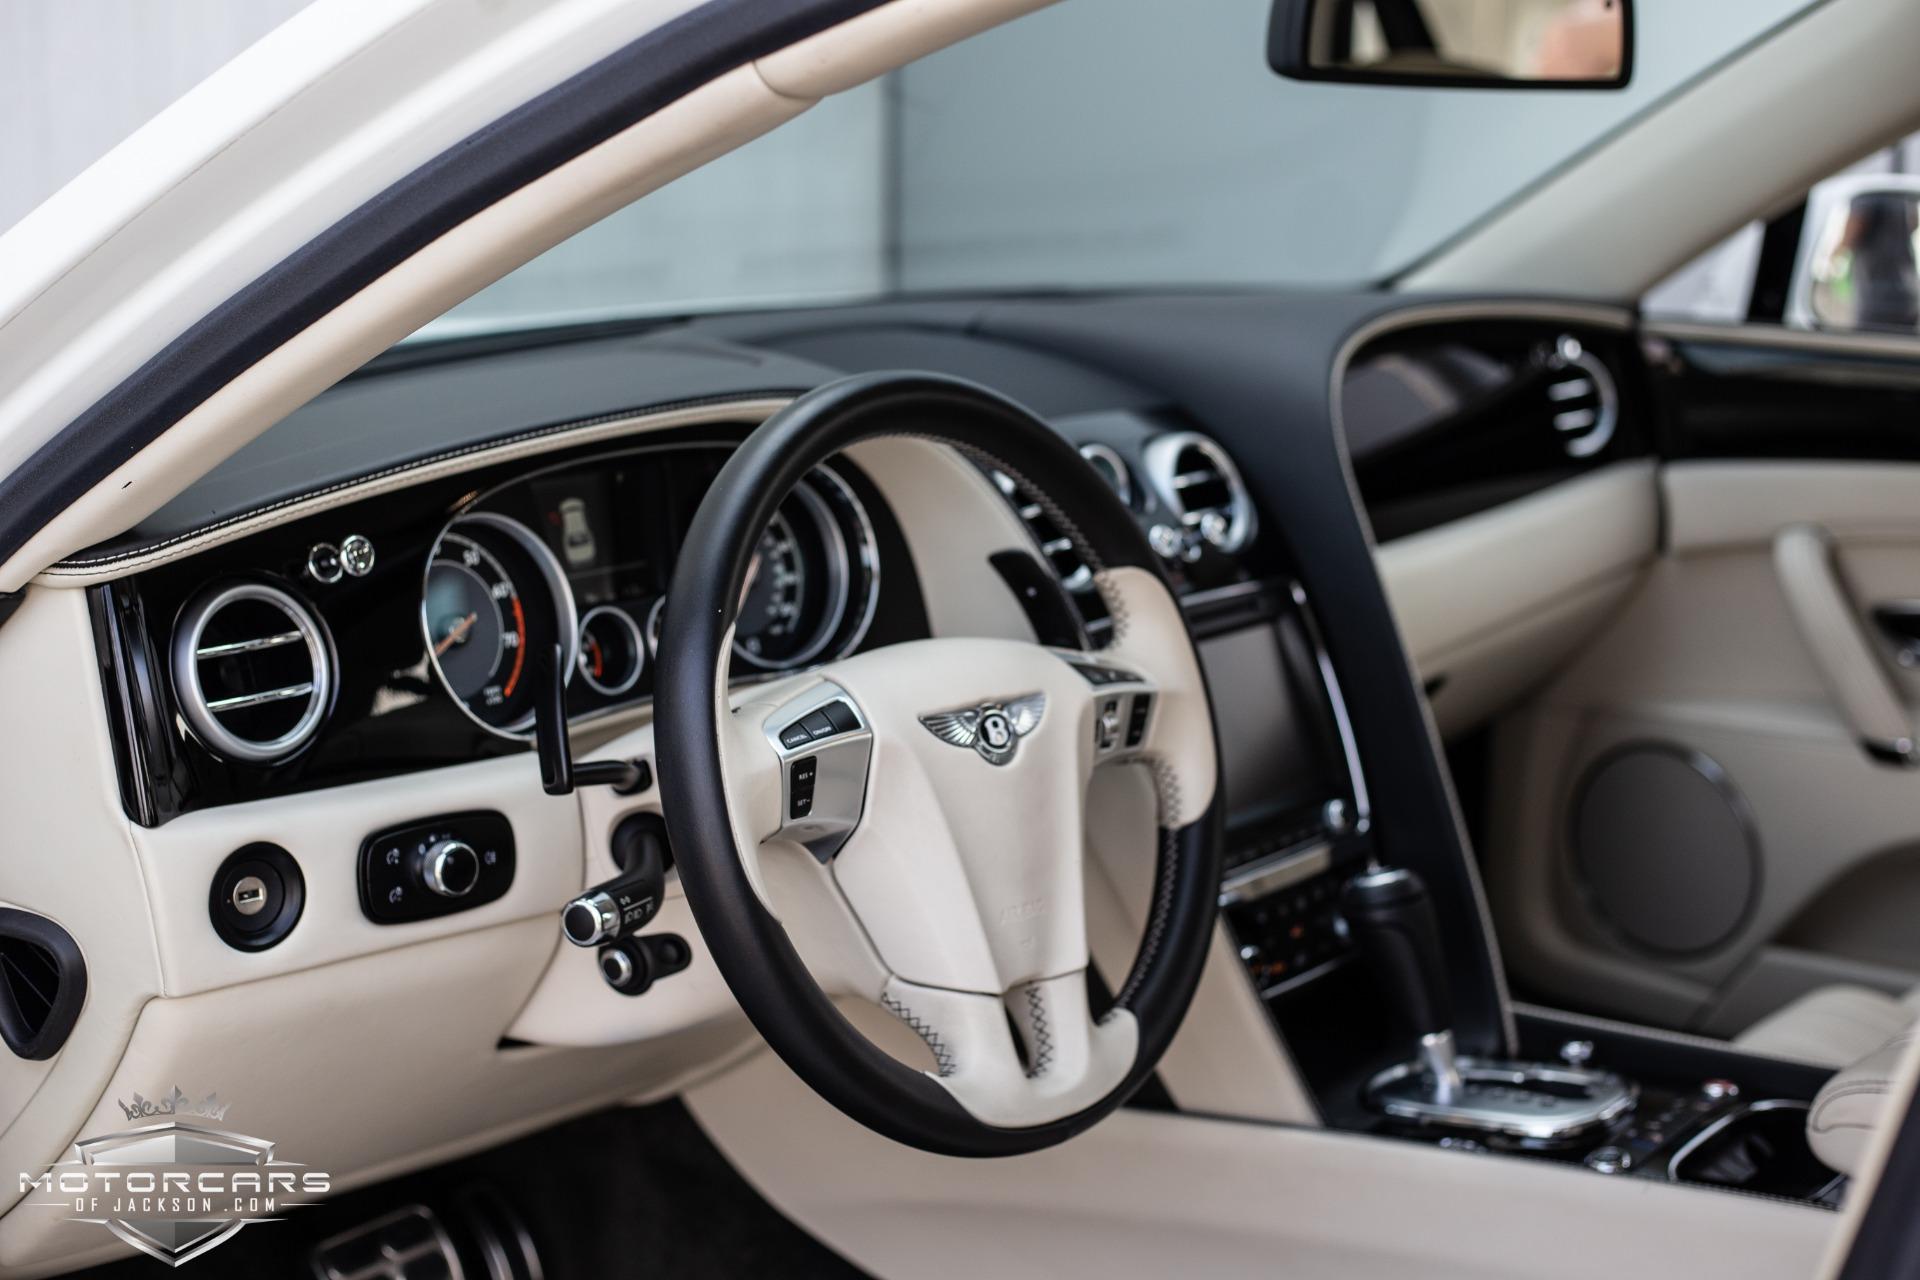 2014 Bentley Flying Spur W12 Stock # EC091768 for sale near Jackson